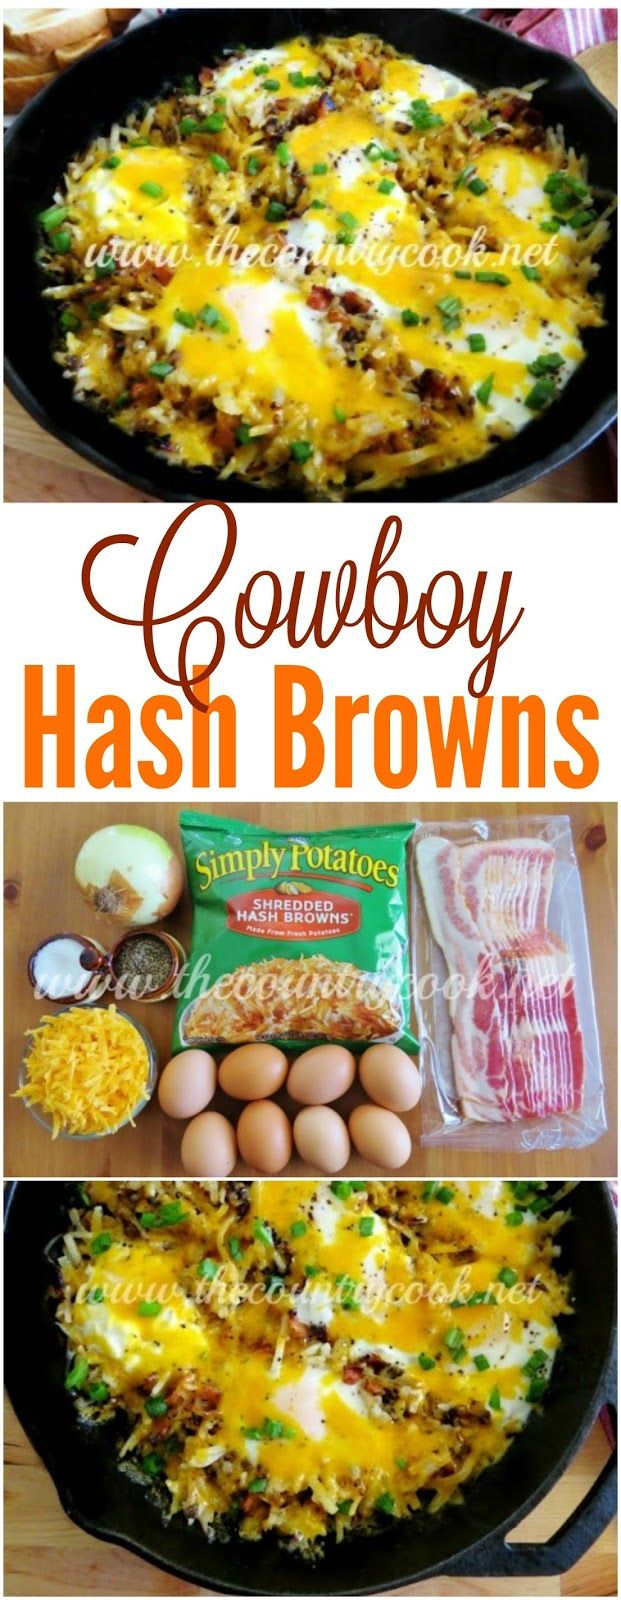 Cowboy Hash Brown Skillet #baconfrittata